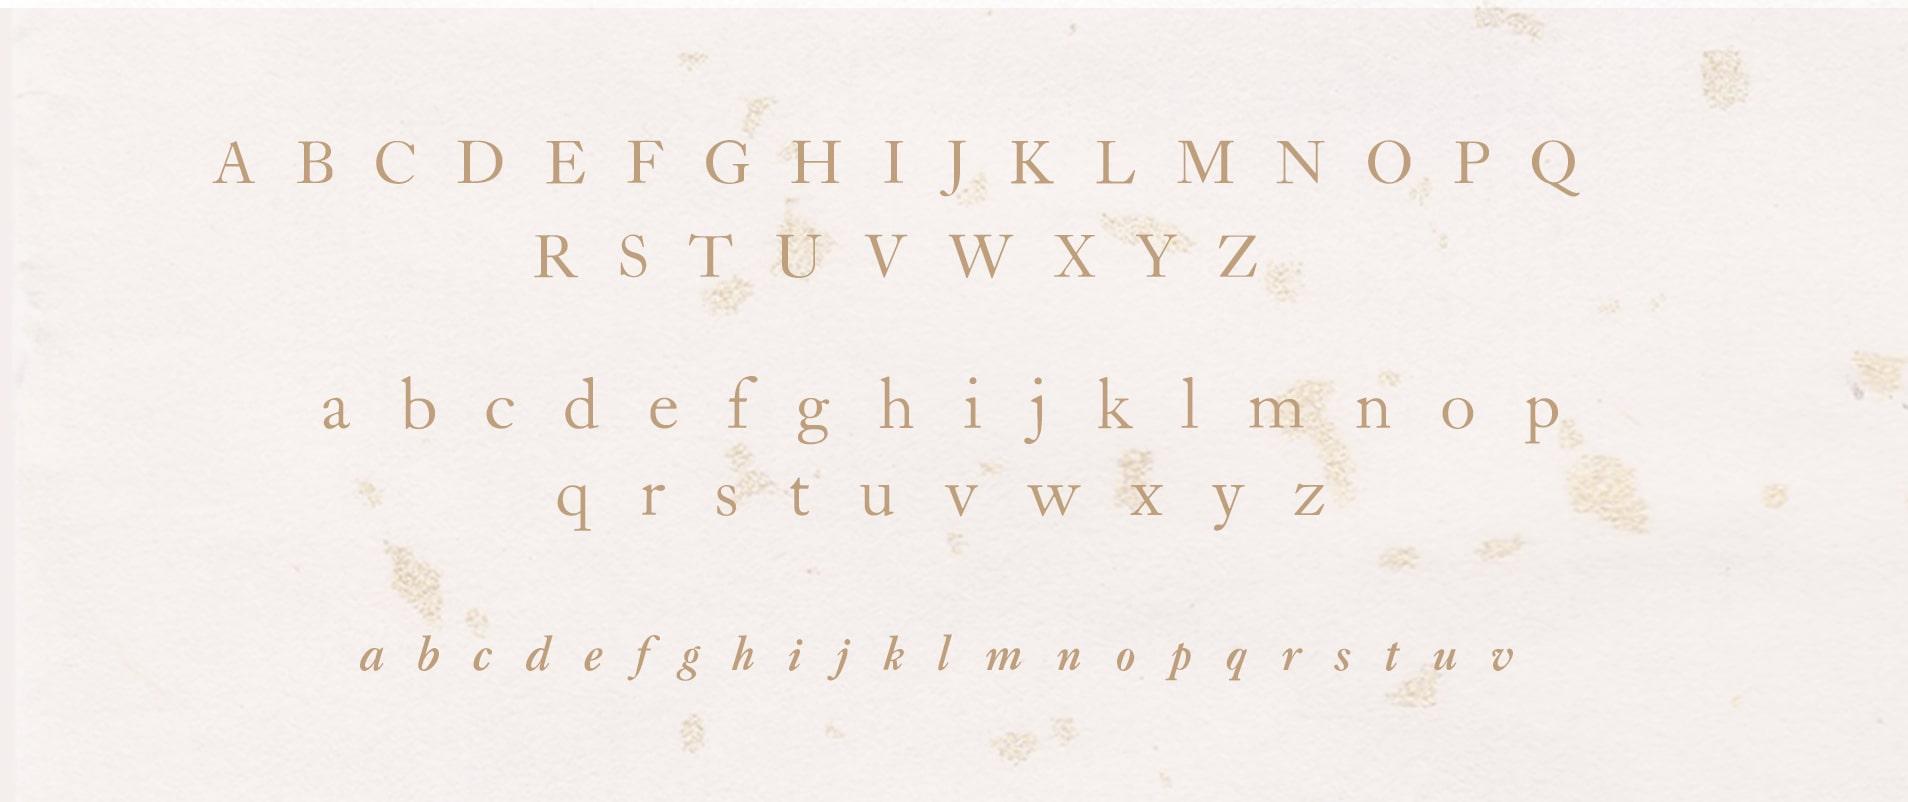 terra-luna-typography-makebe.jpg